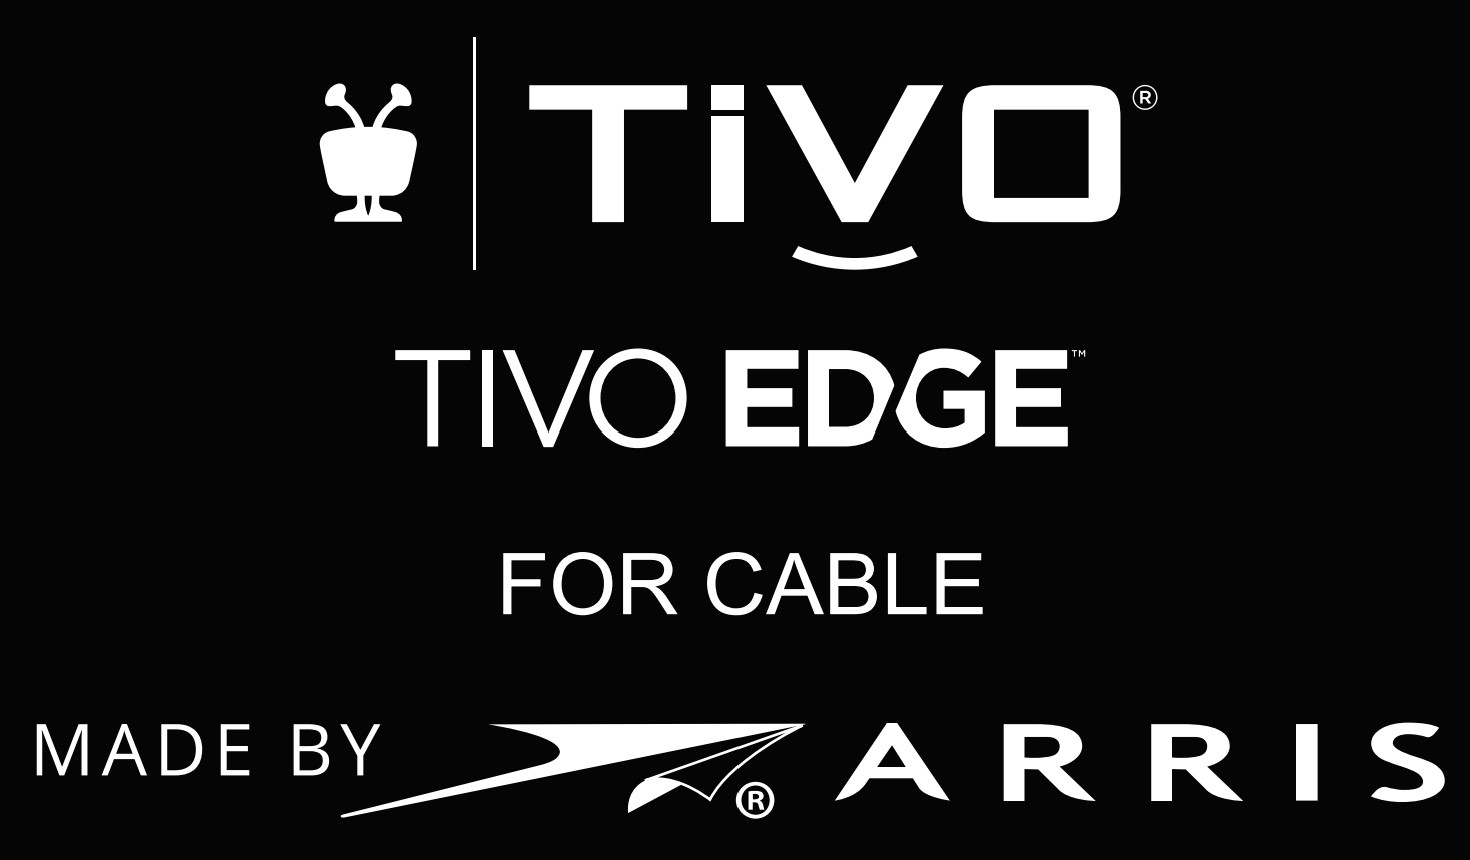 TiVo-serie 2 hook up